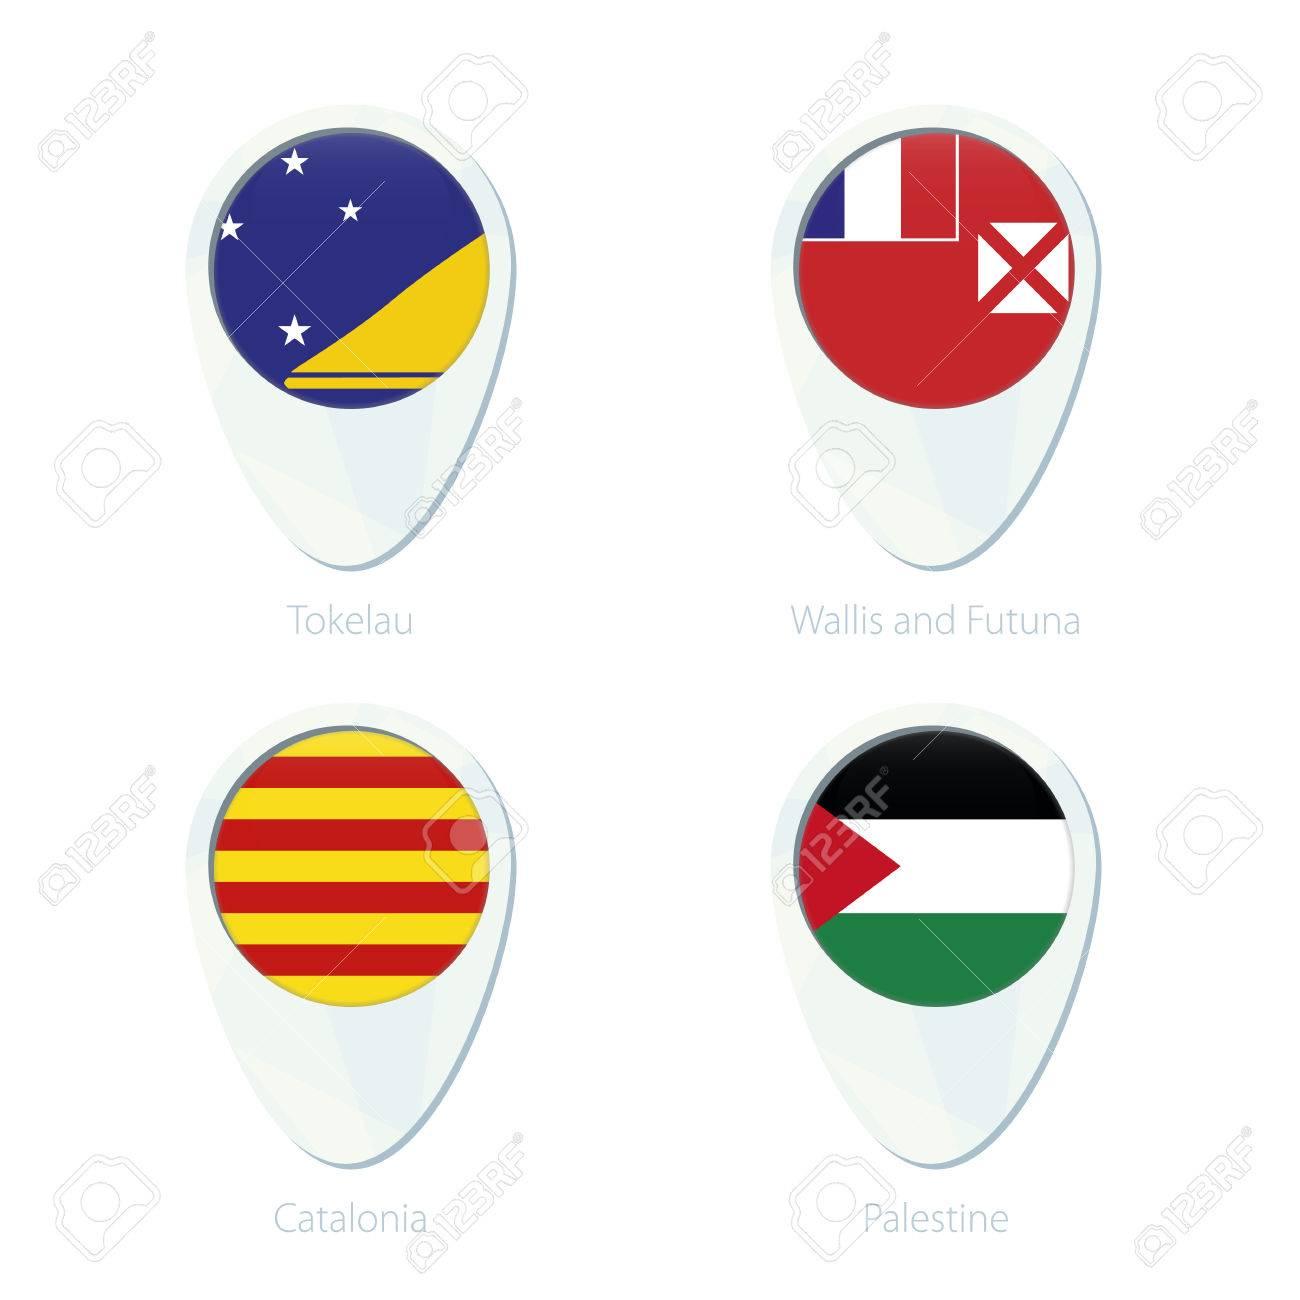 Tokelau Wallis And Futuna Catalonia Palestine Flag Location